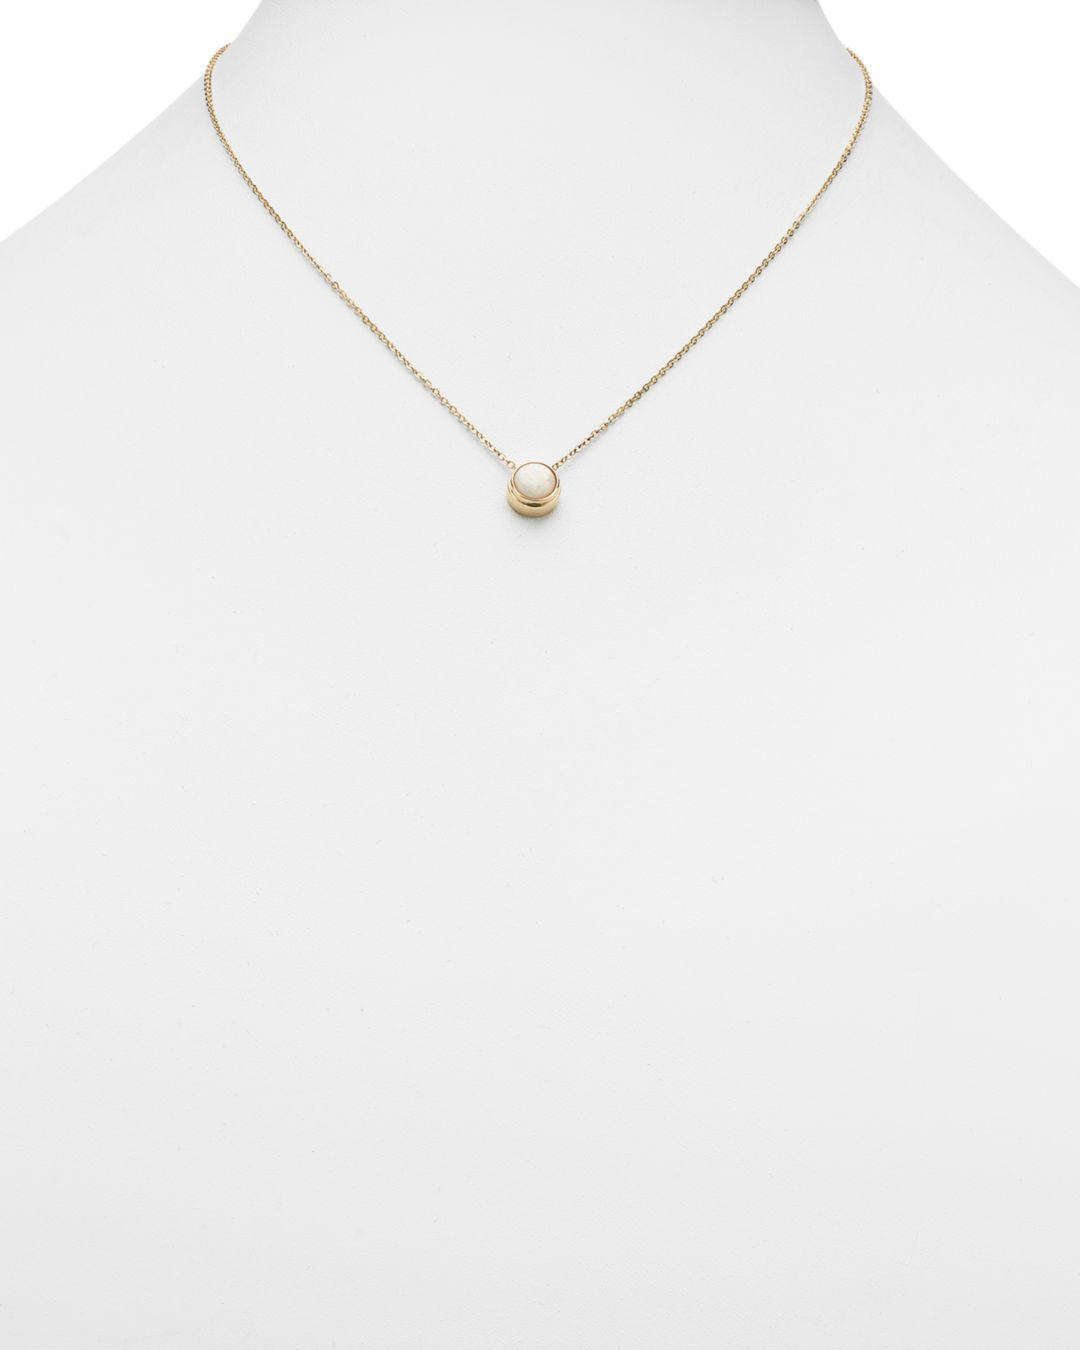 Bloomingdale's Opal Bezel Set Pendant Necklace In 14k Yellow Gold in White/Gold (Metallic)